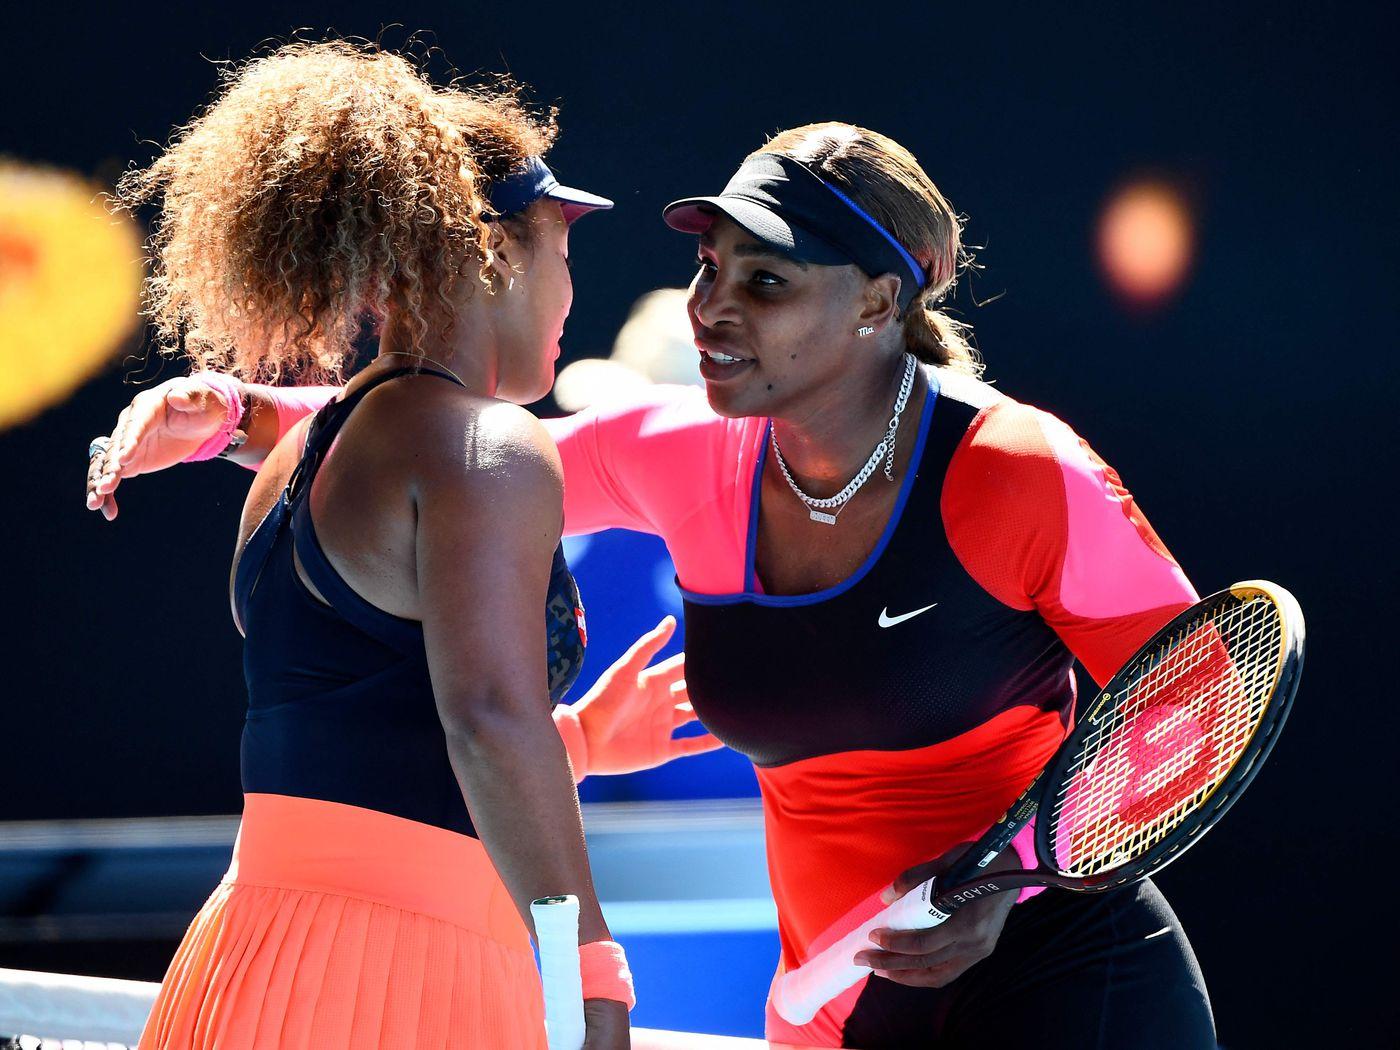 Osaka Does It Again, Sends Serena Williams Back Home